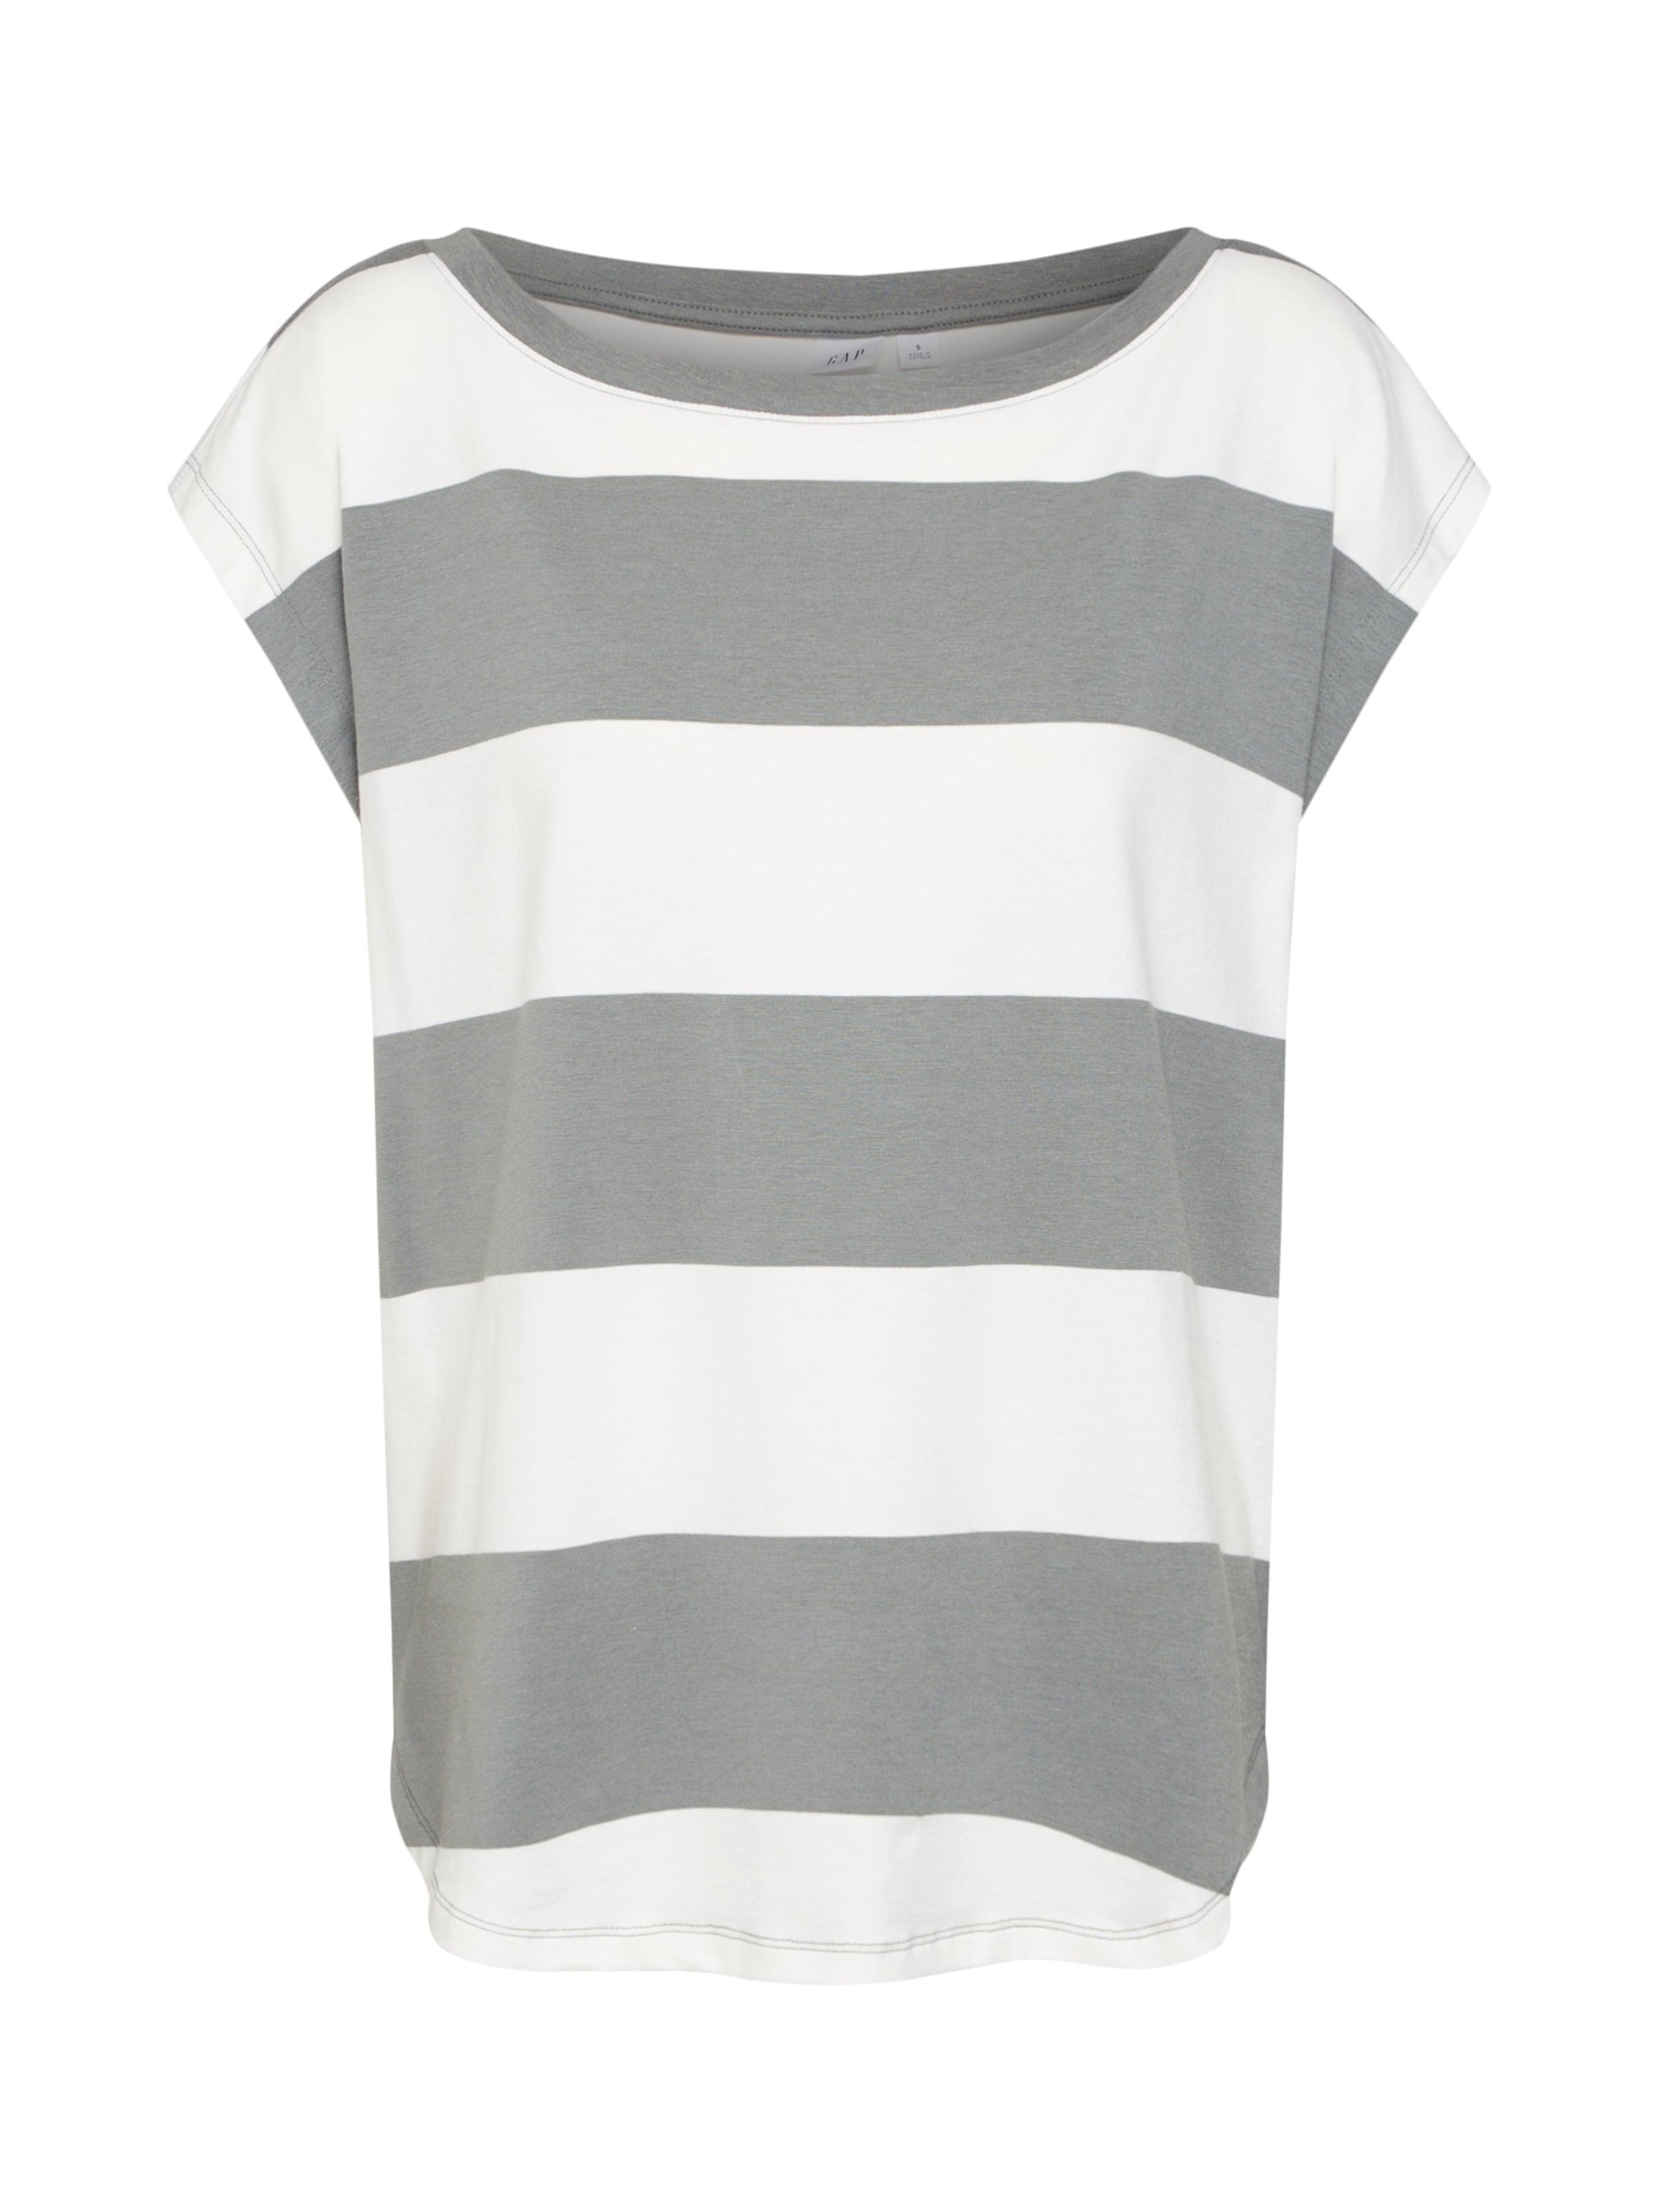 In T Gap Gap Hellgrün shirt shirt In Gap T shirt In Hellgrün T vm80wnN